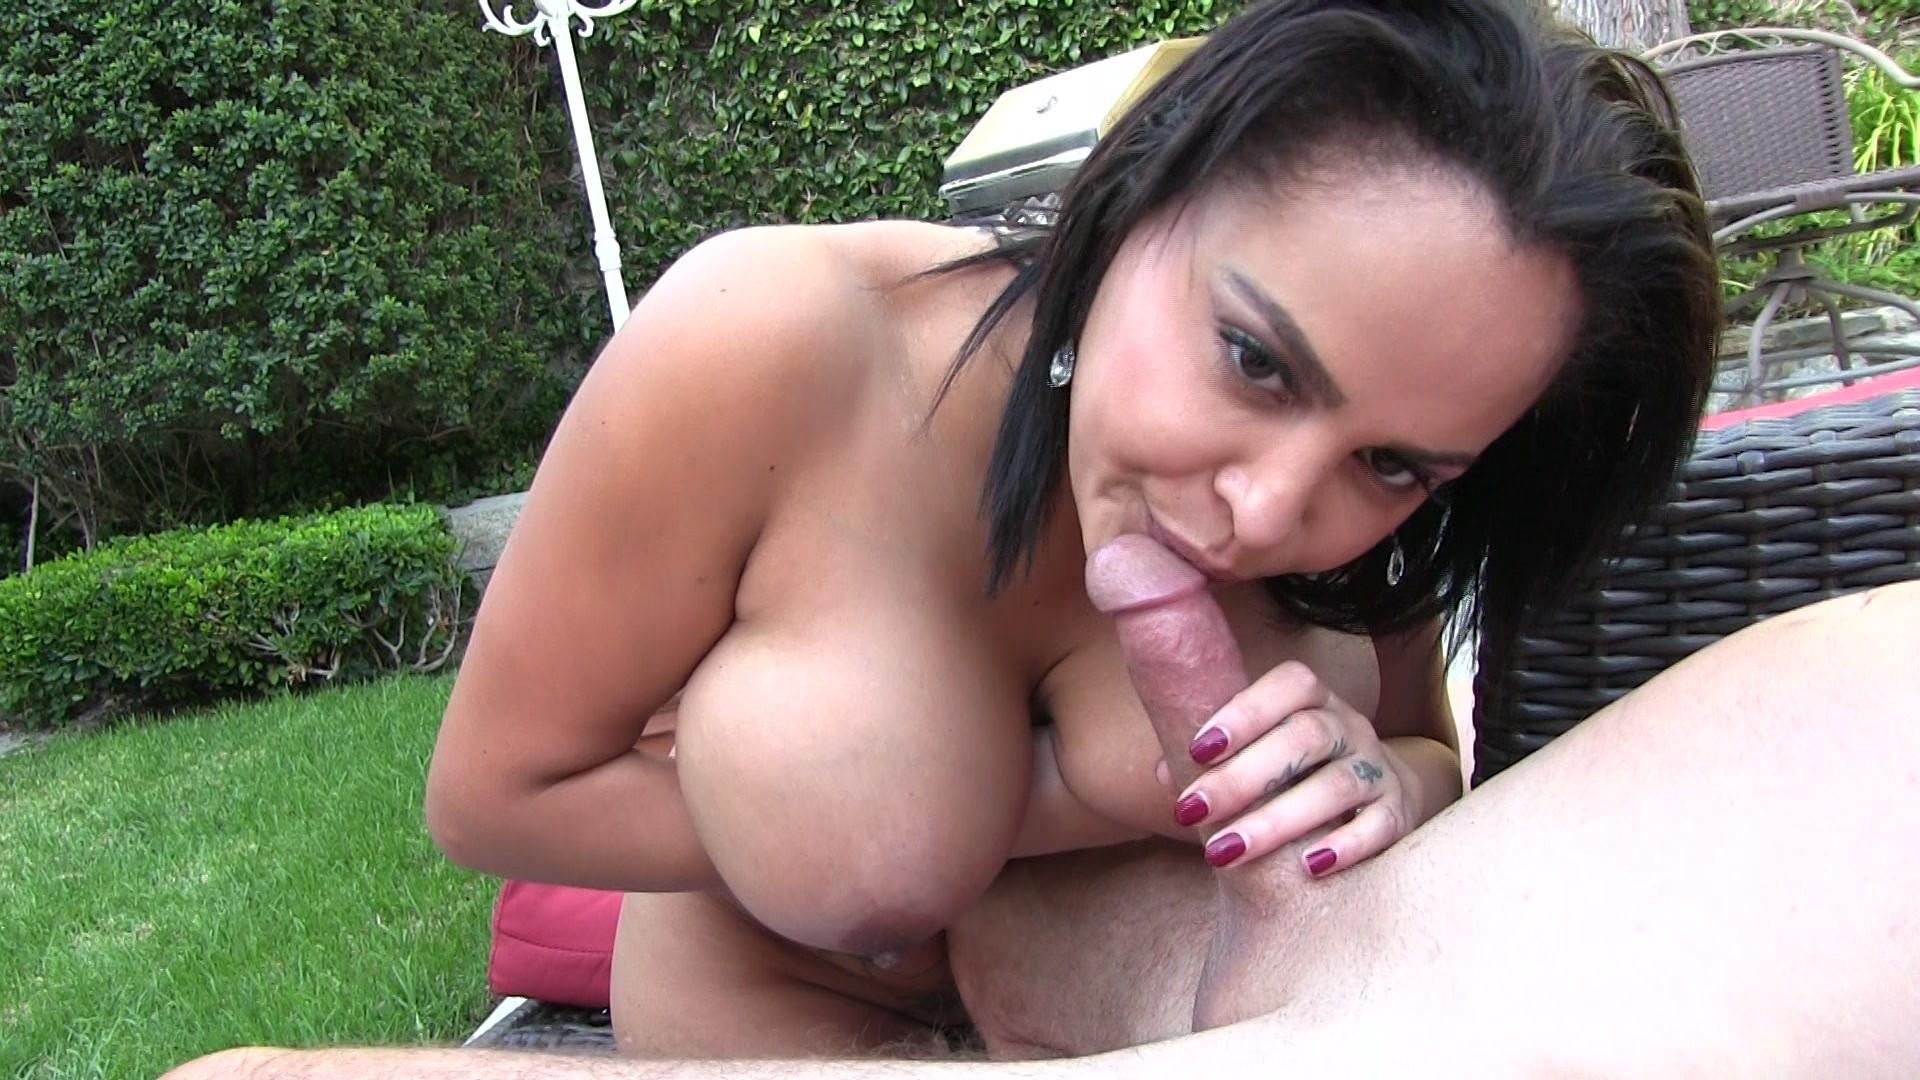 Watch Trailer_park_trash_white_girl_heidi_dirity_feet_and_big_ass